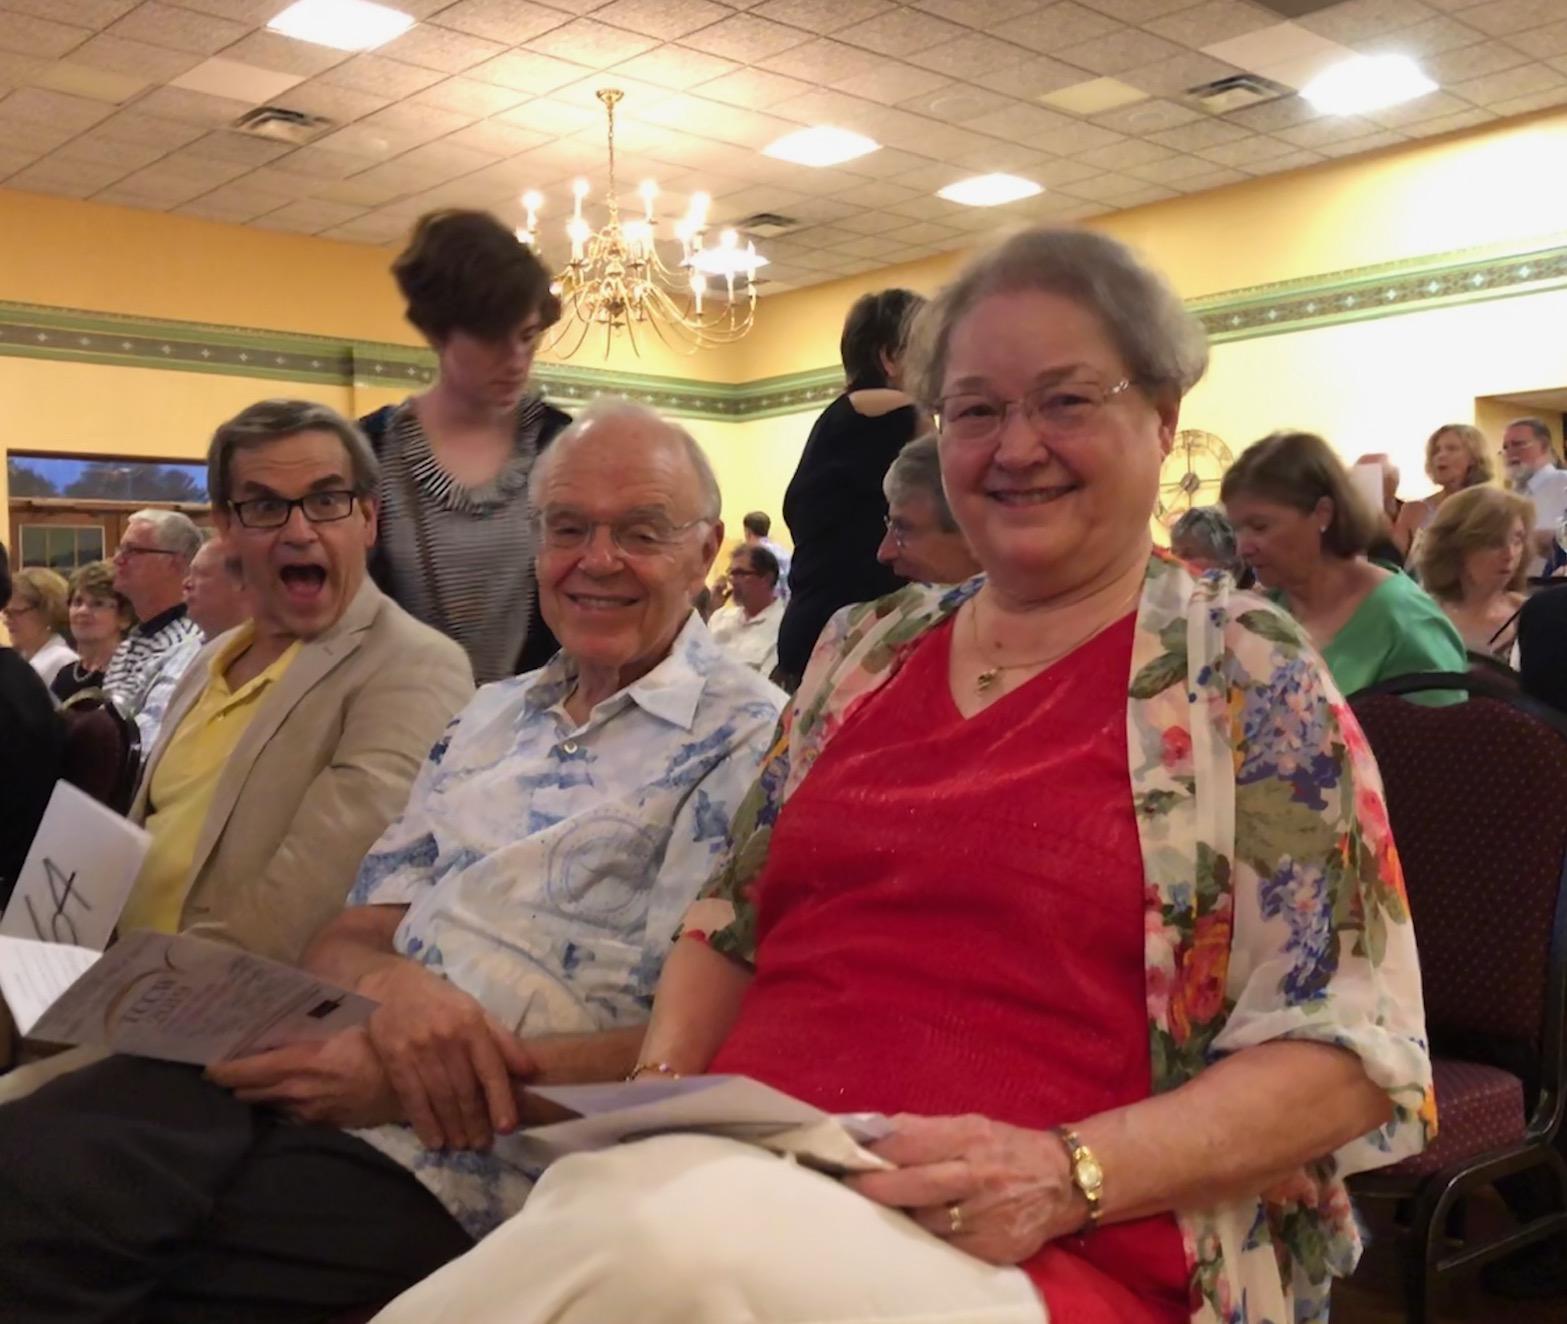 Jim Shaffran with Bob & Sharon Shafer